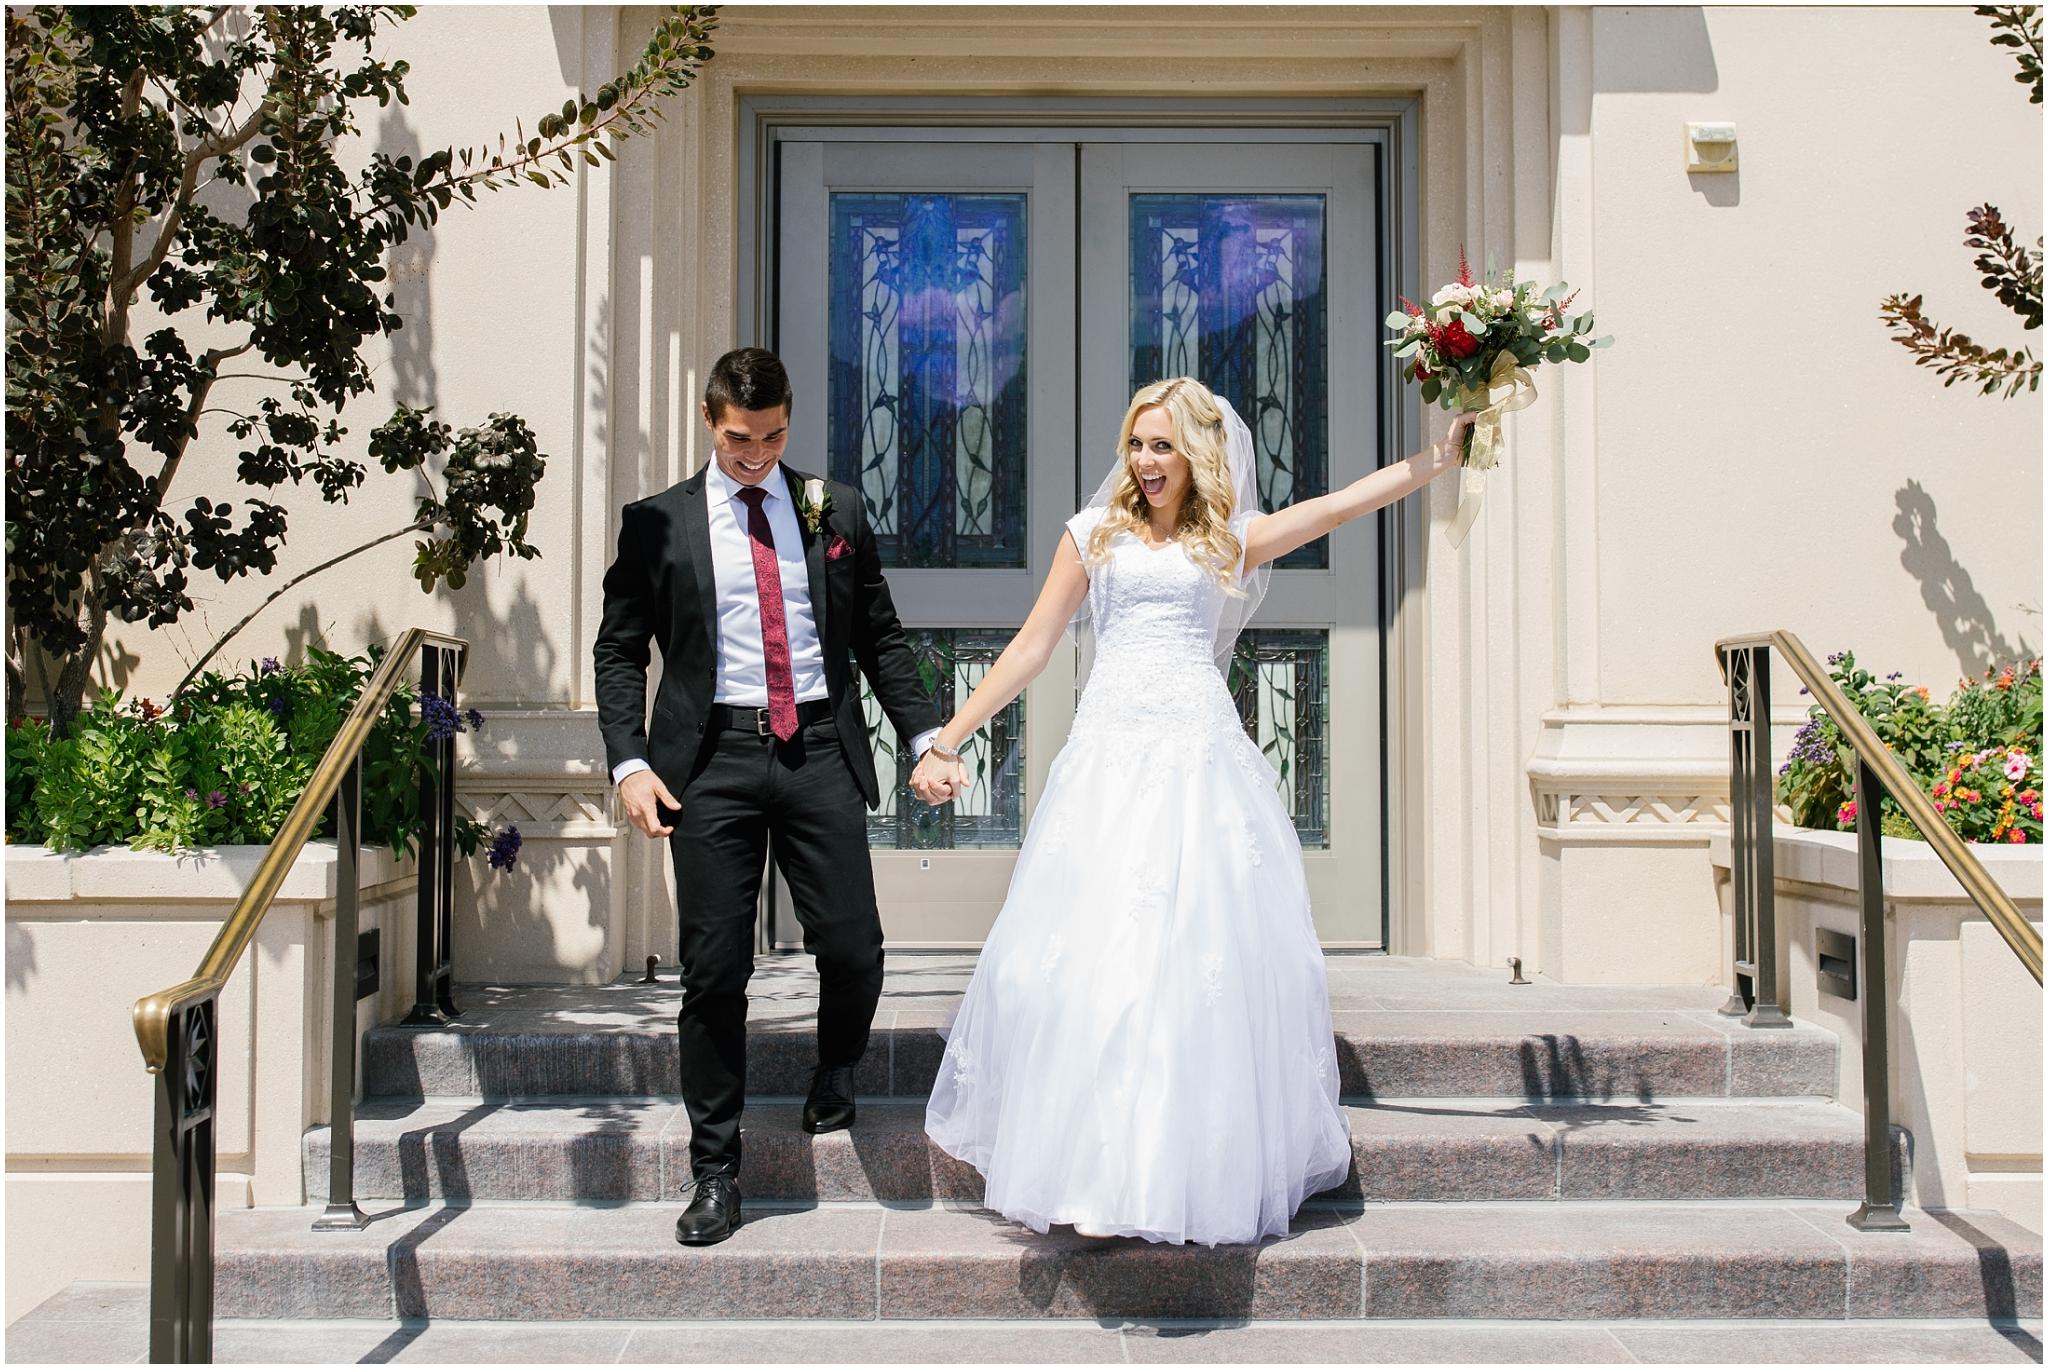 HannahChaseWedding-10_Lizzie-B-Imagery-Utah-Wedding-Photographer-Park-City-Salt-Lake-City-Payson-Temple-Clarion-Garden-Center.jpg